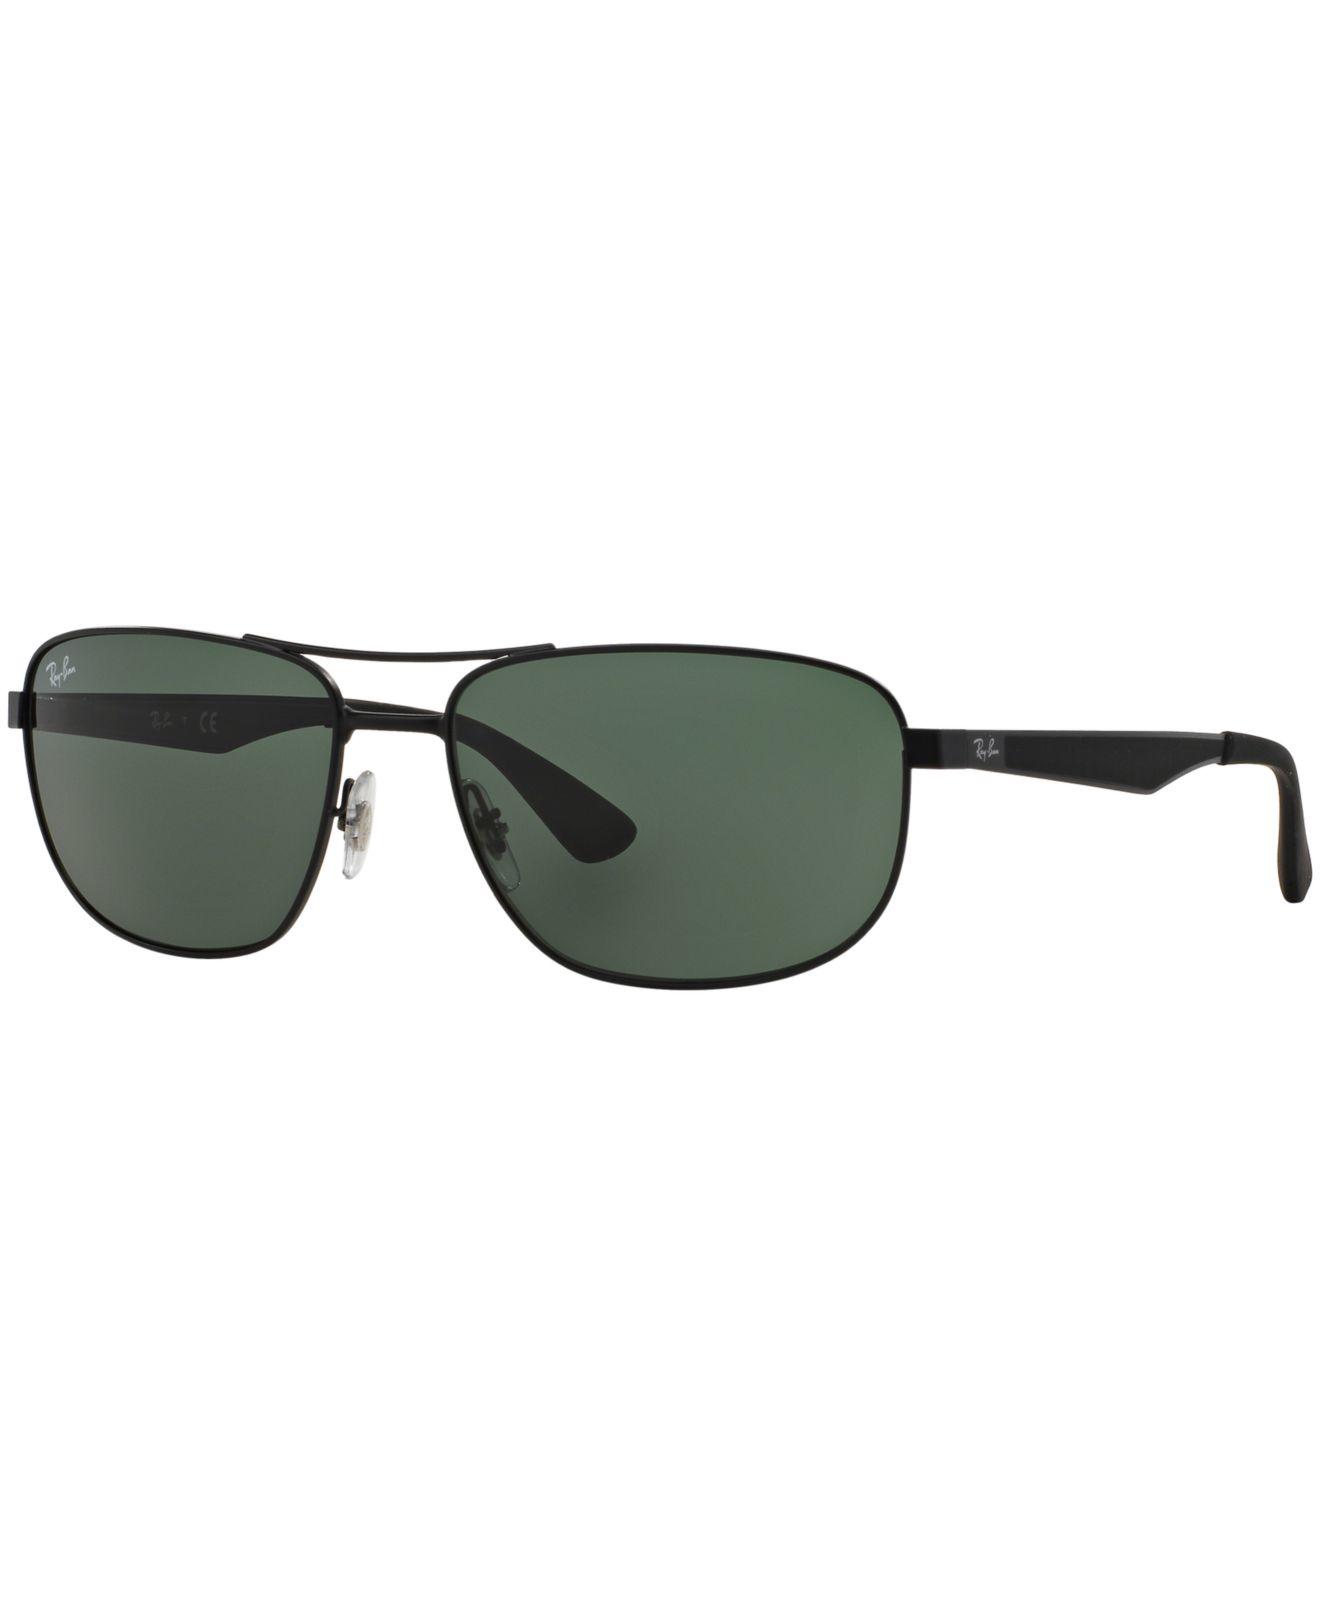 1eeb8875d9a ray ban rb 3502 61. RB3502 004 58 Sunglasses ...